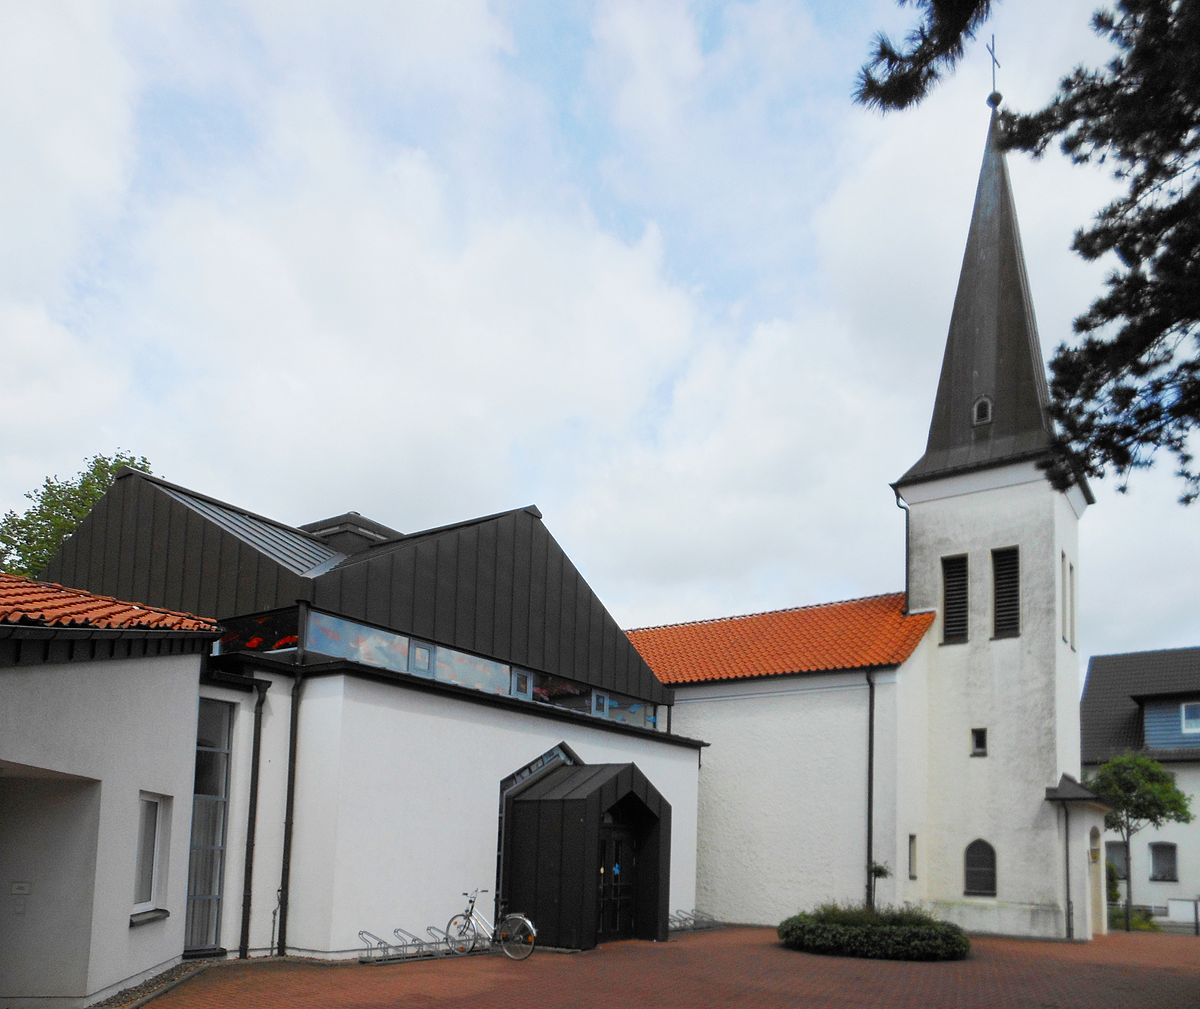 Puff Bad Nenndorf